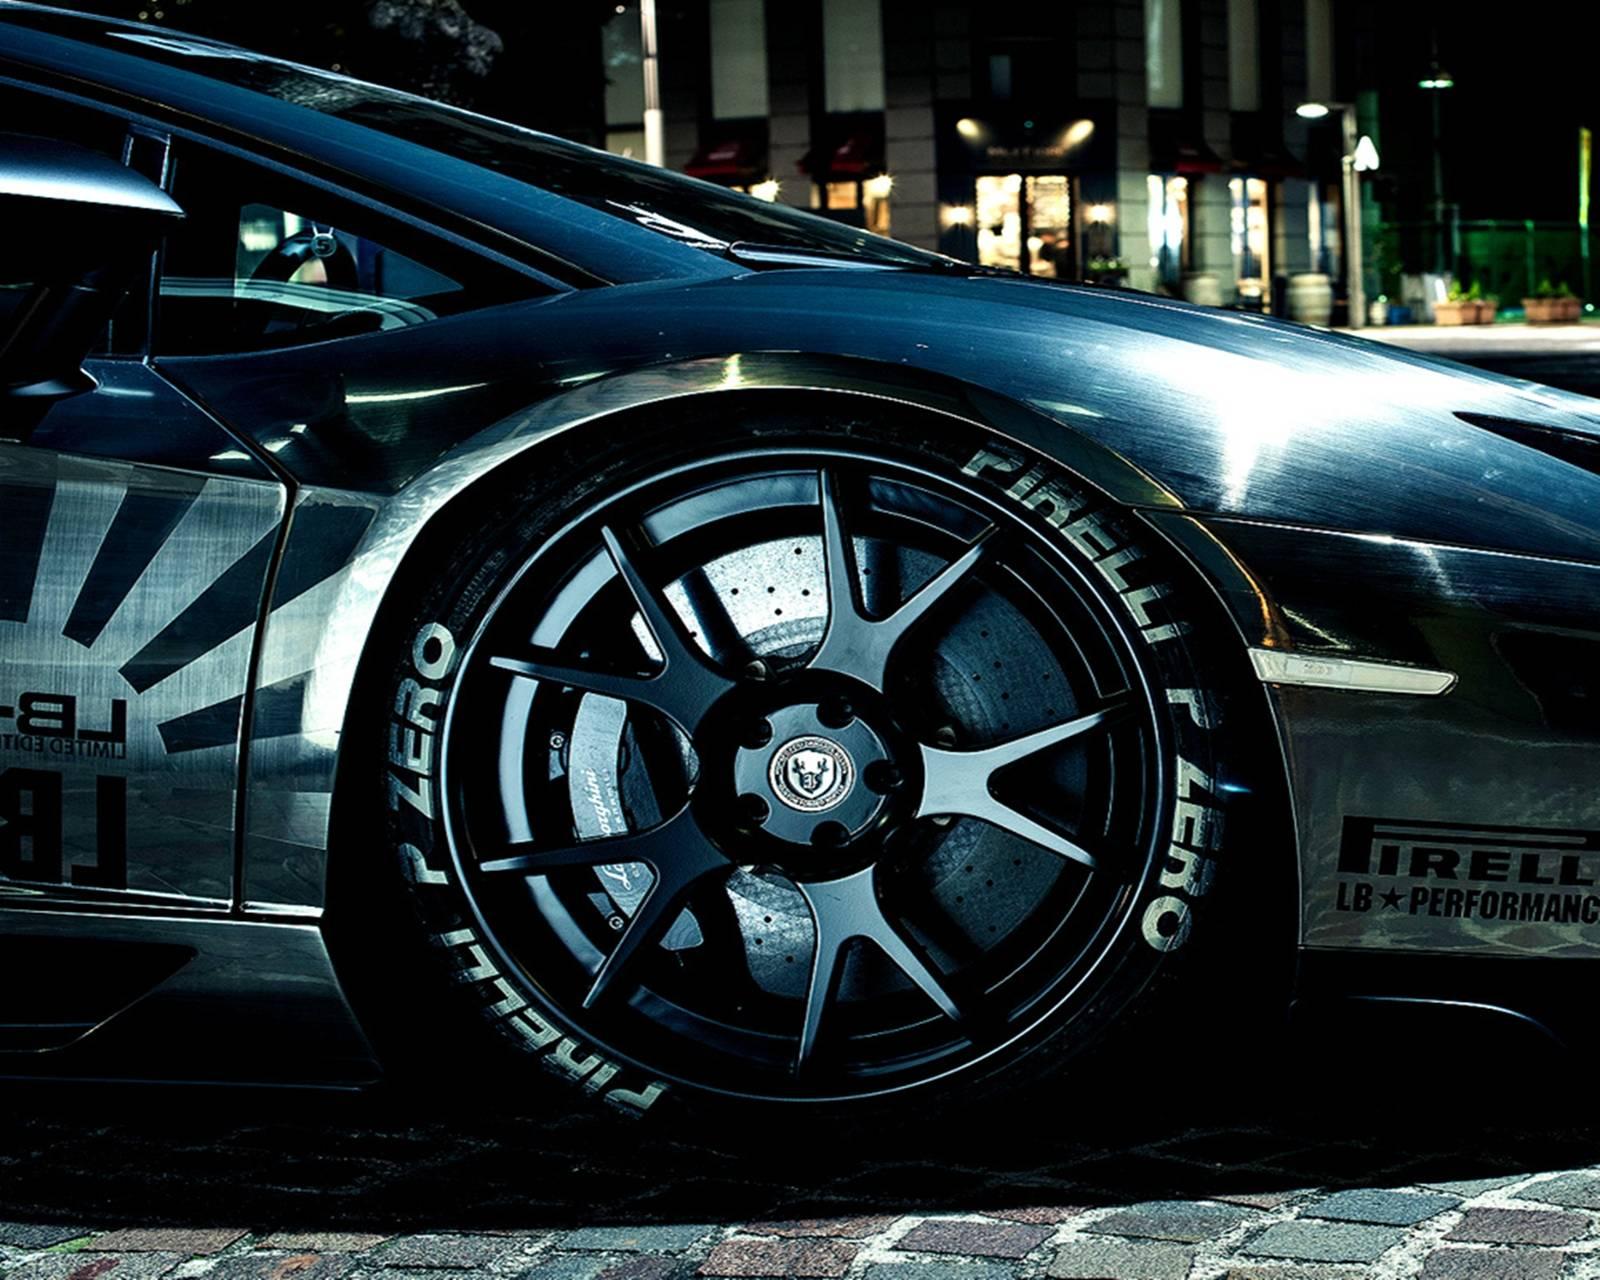 Pirelli Wheels